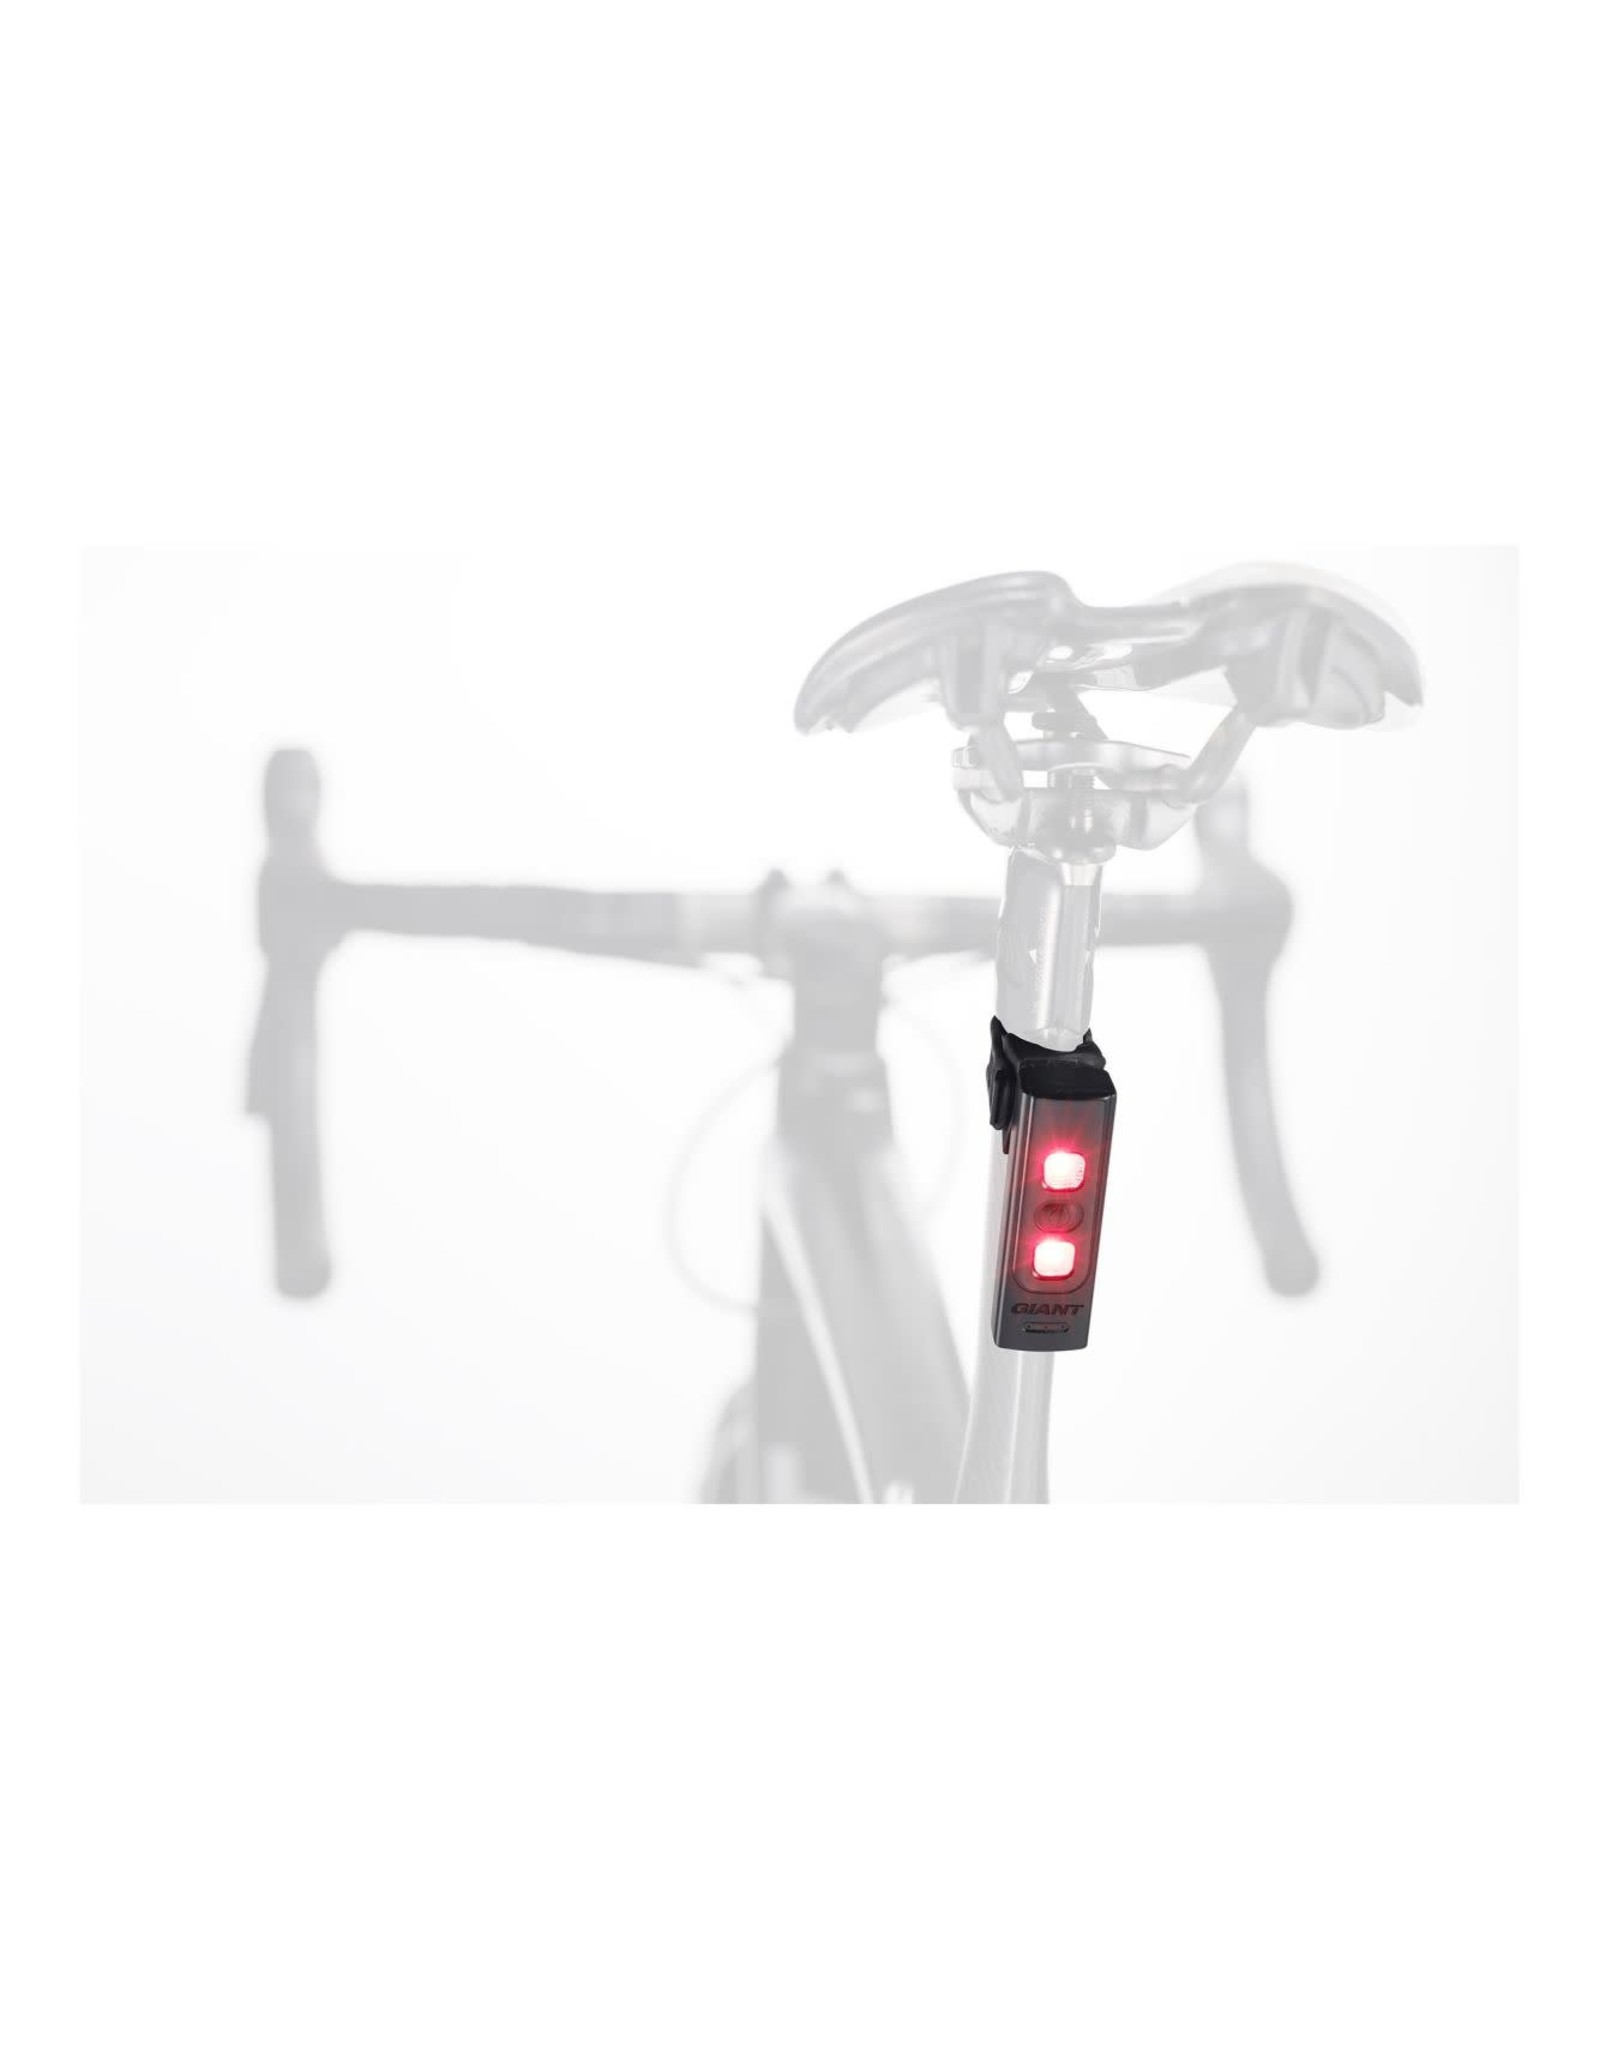 GIANT Giant Numen+ Tag Rear Light